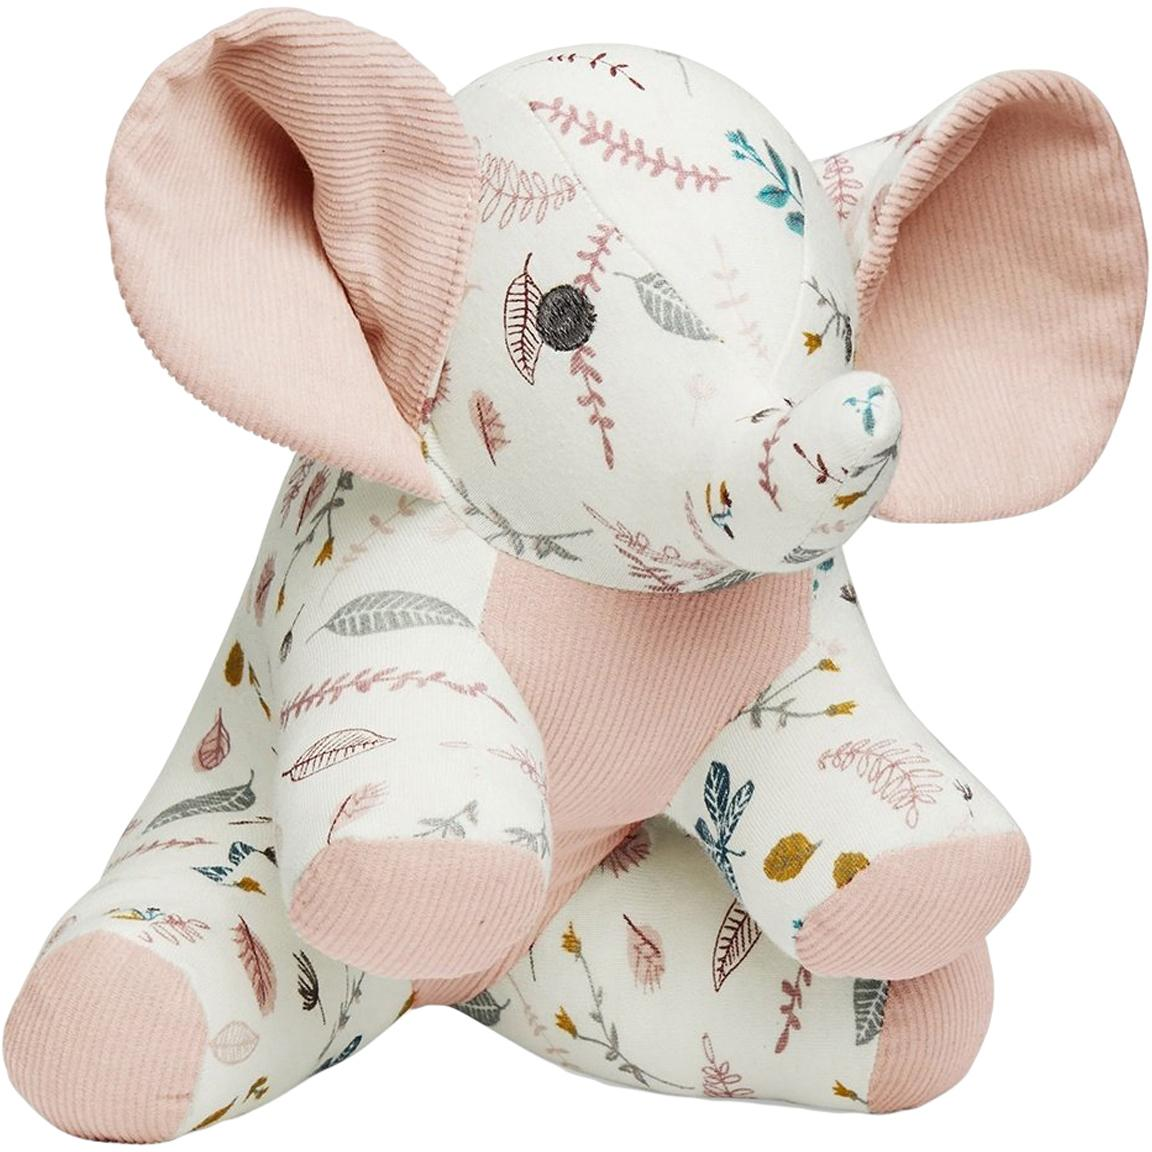 Peluche de algodón ecológico Elephant, Exterior: algodón ecológico, certif, Blanco, tonos rosas, amarillo, An 20 x Al 21 cm